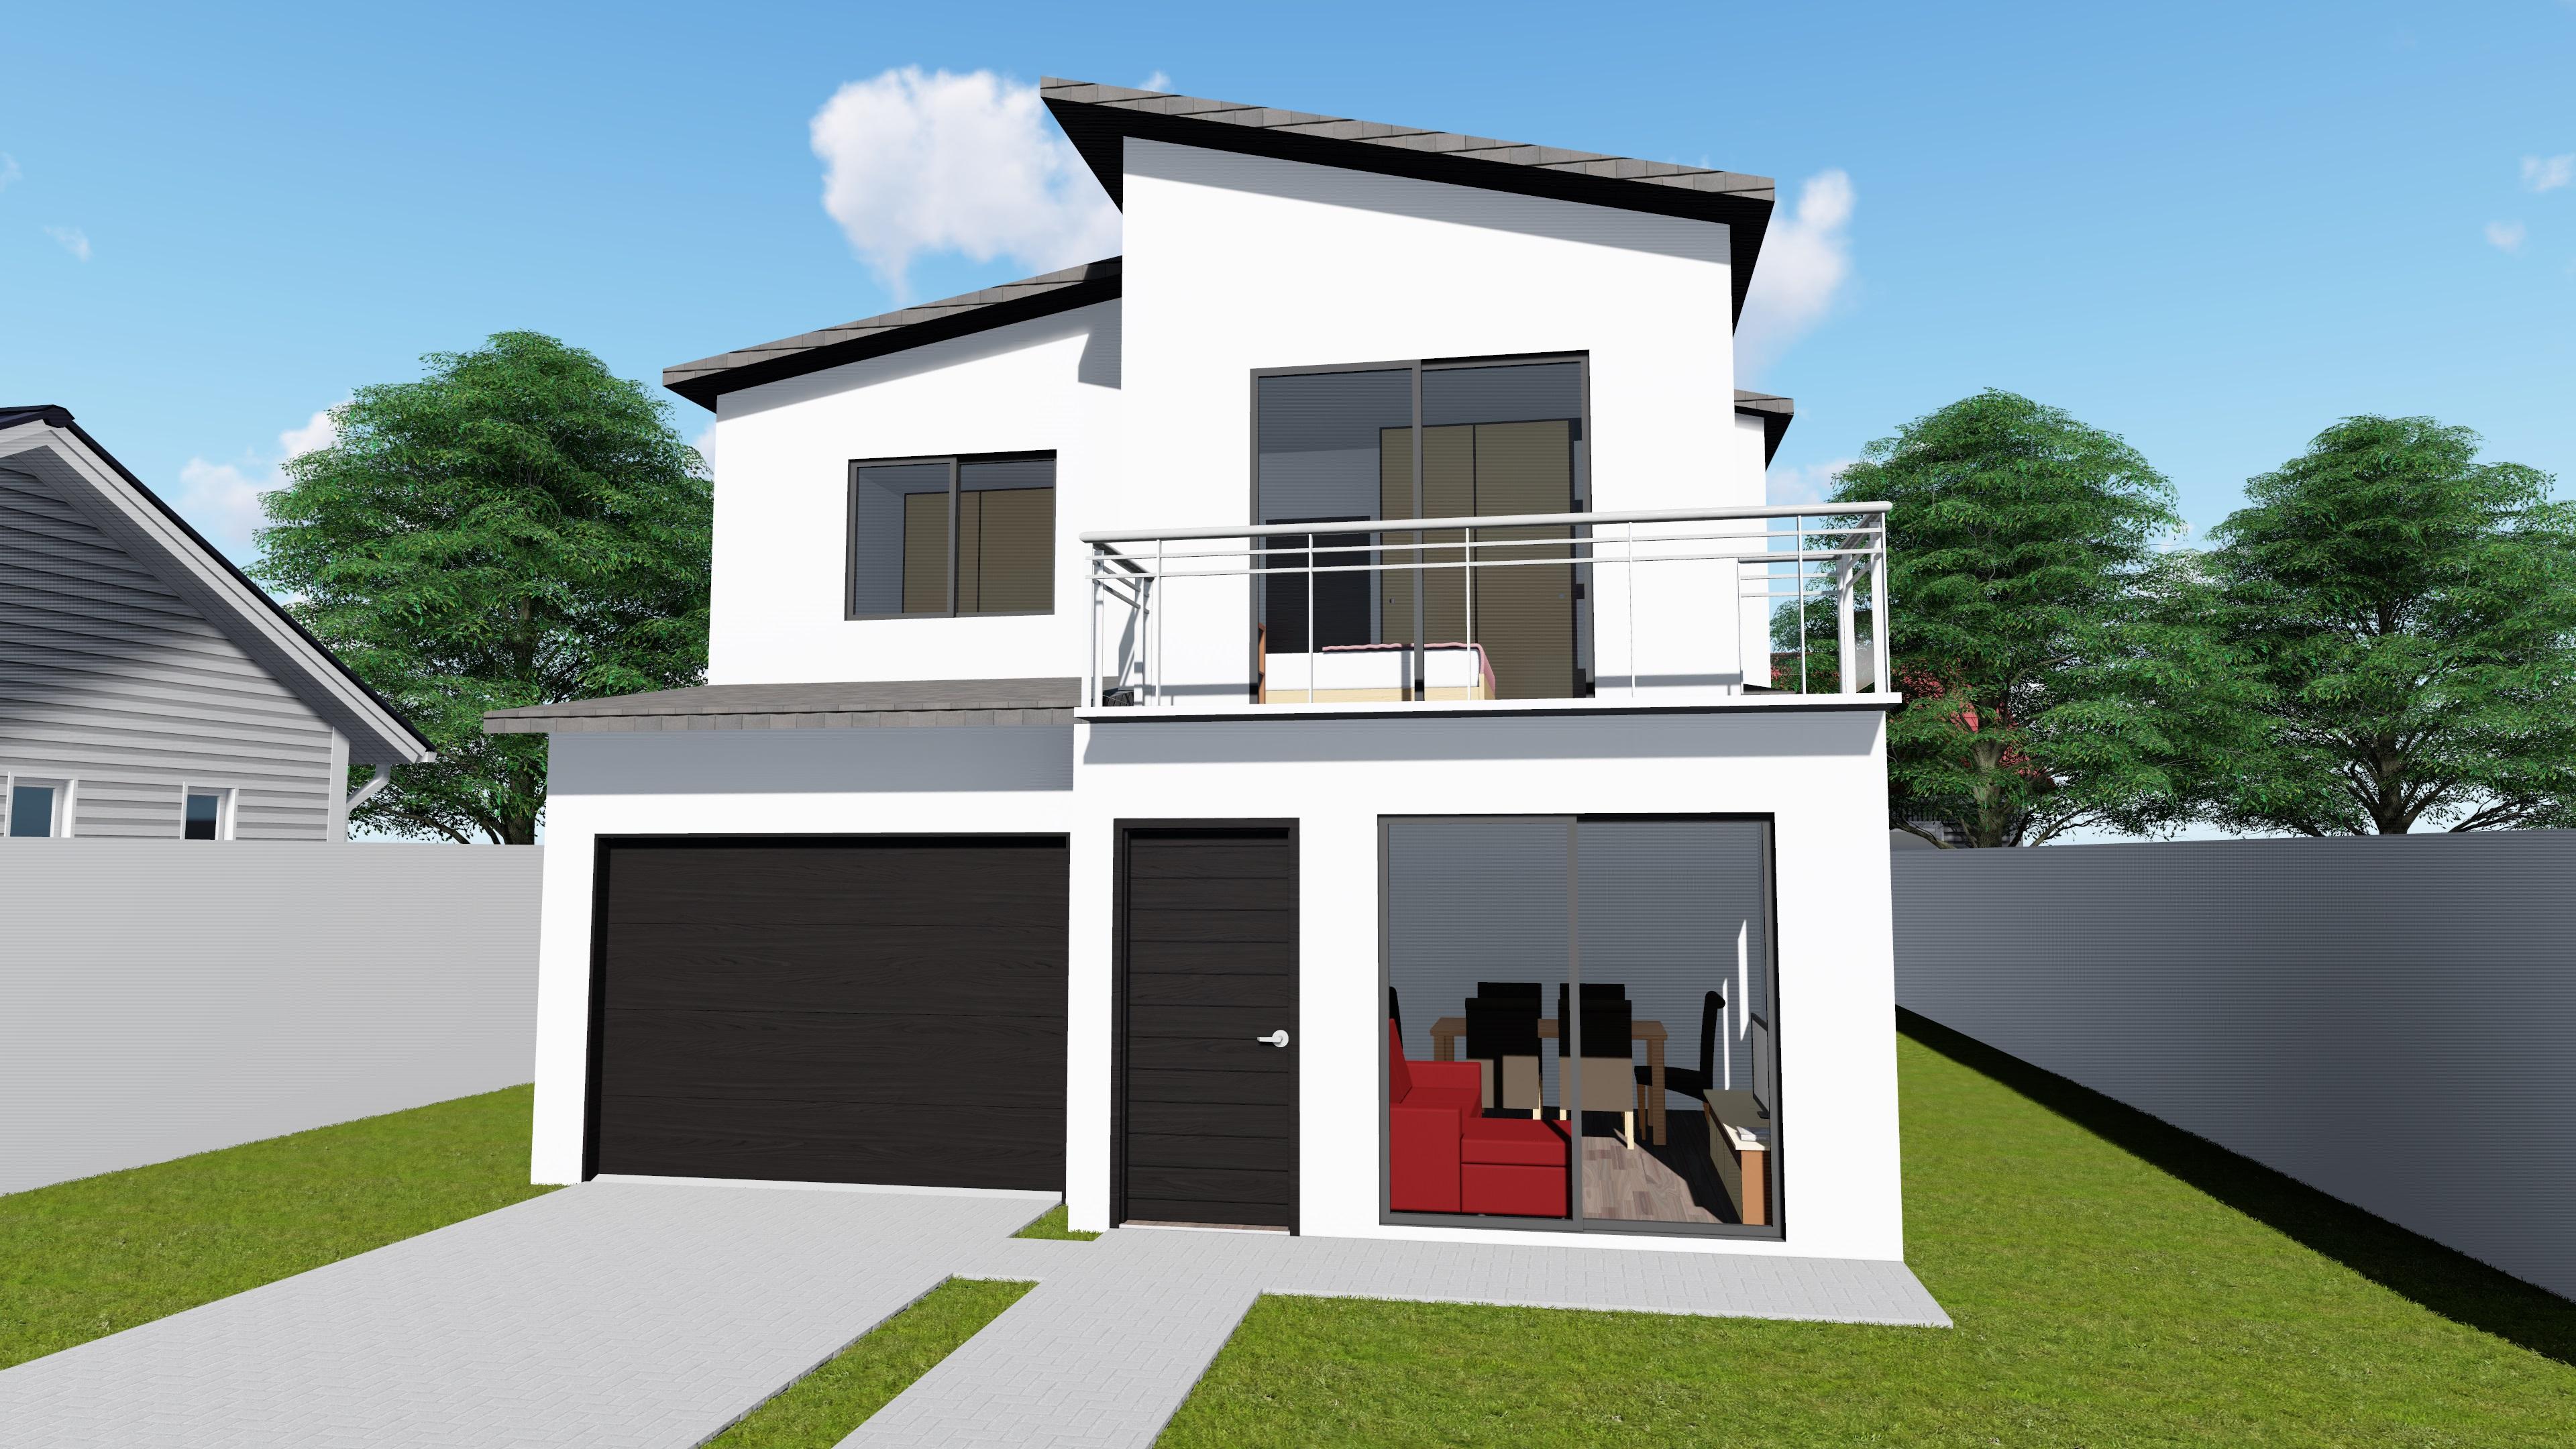 casas steel frame modelos prontos sulm dulos sistemas